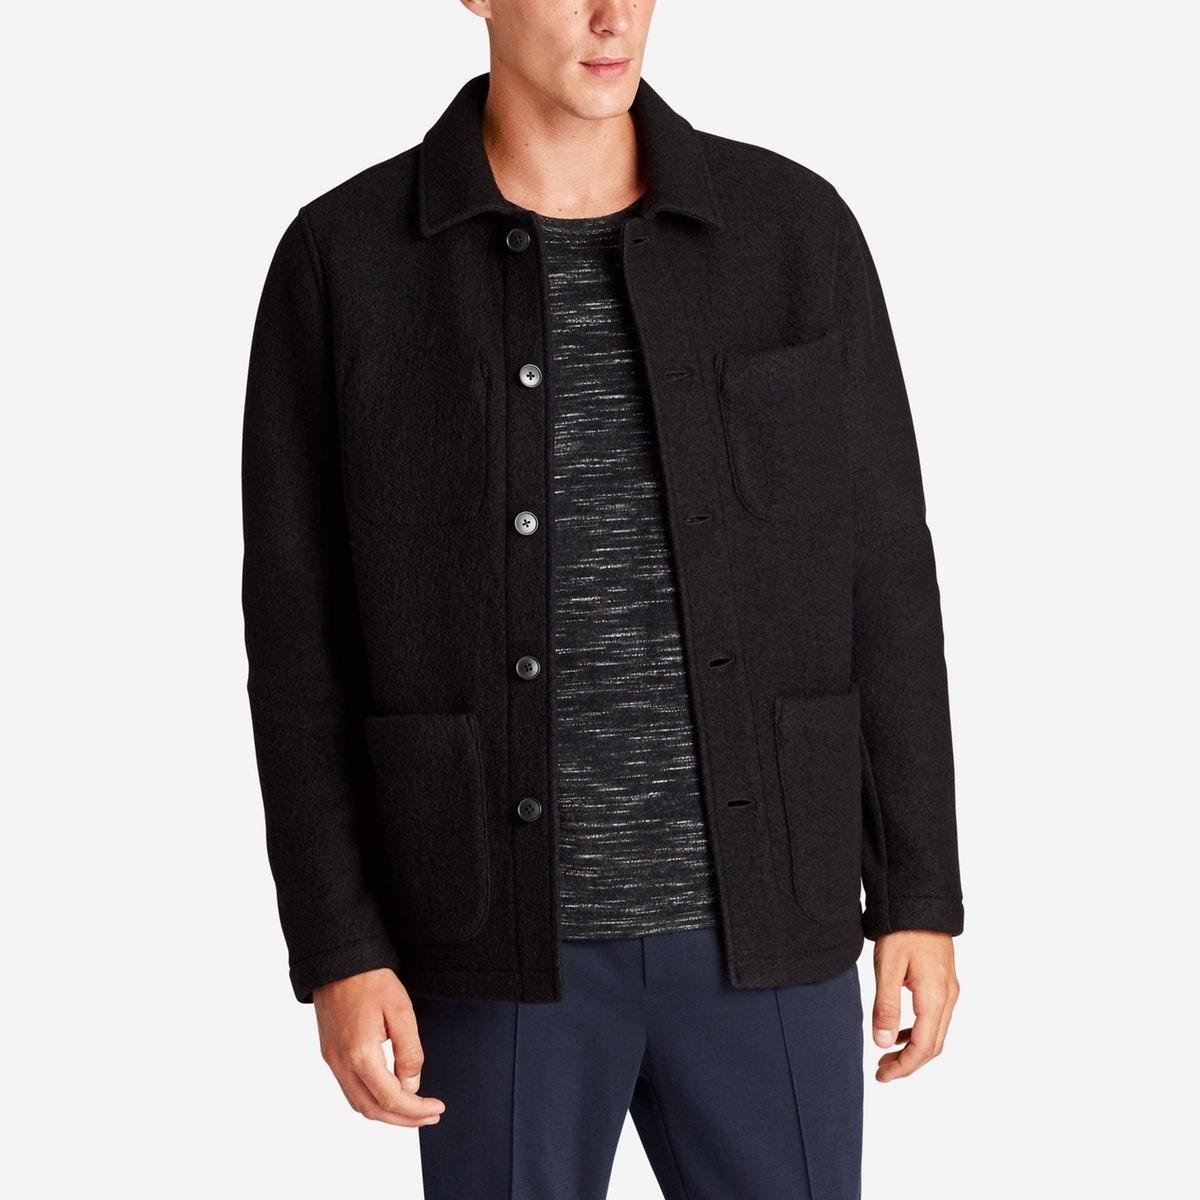 The Boucle Sweater Jacket